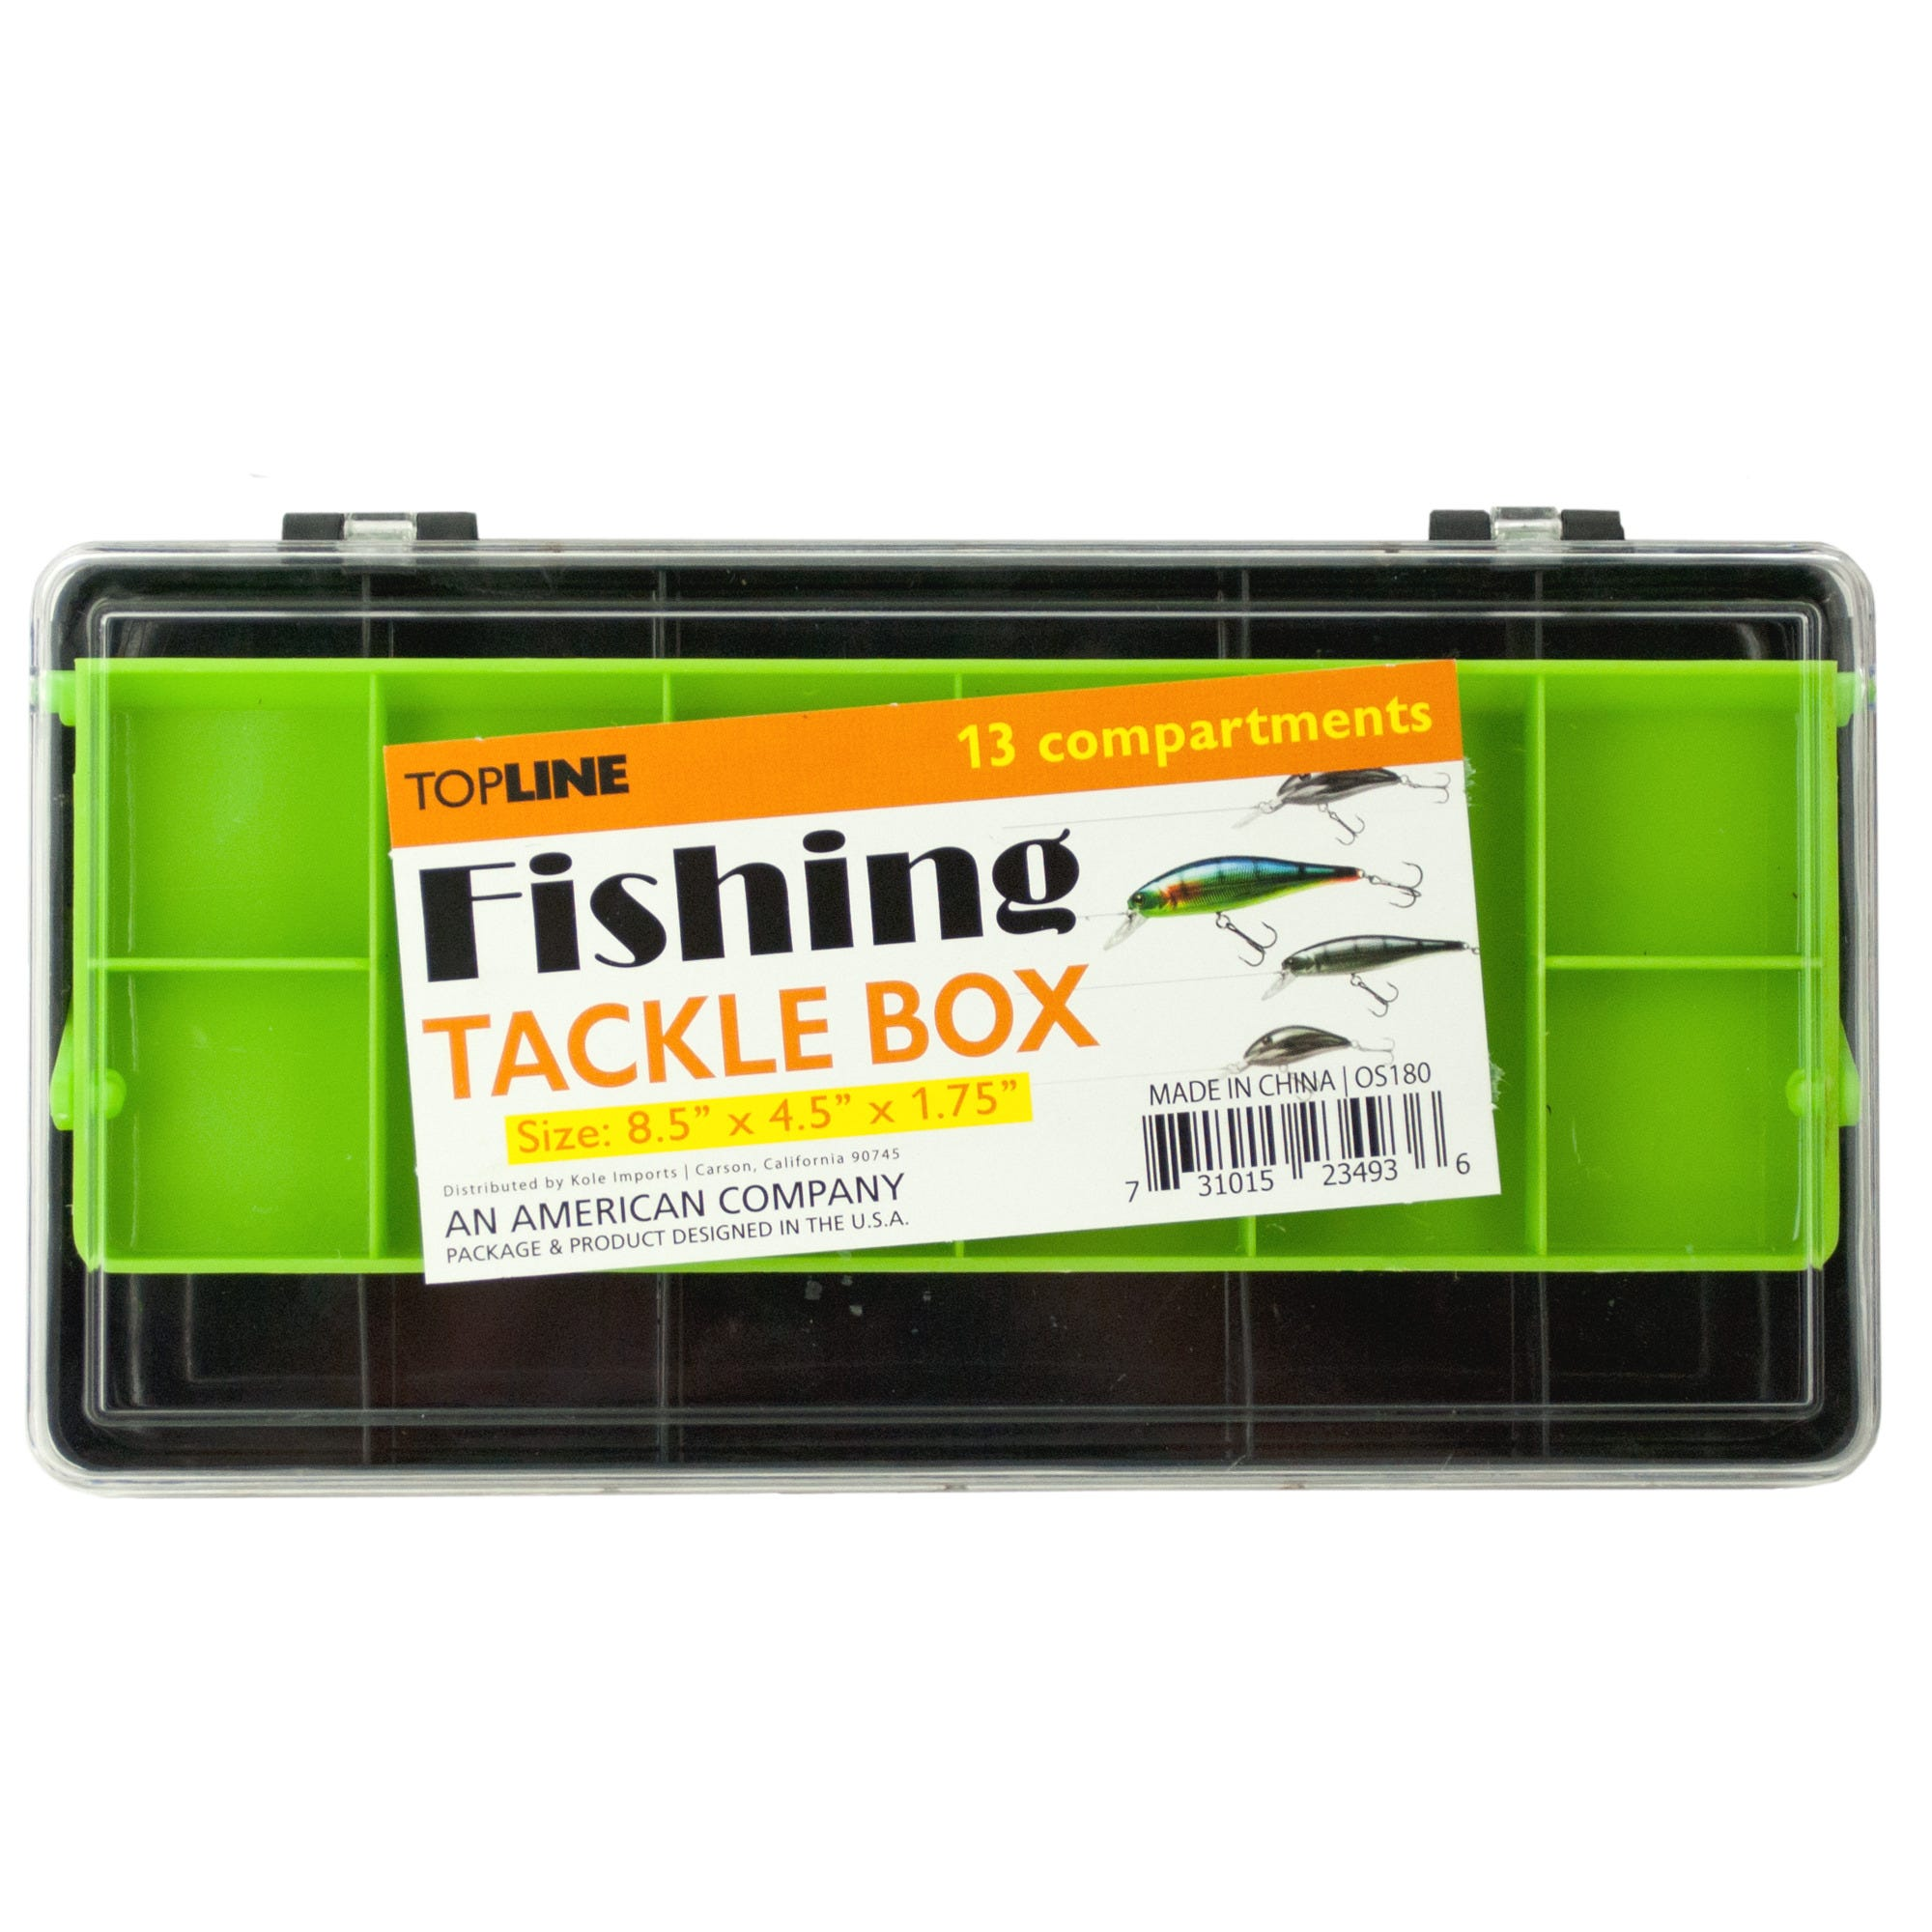 Fishing tackle craft supplies - Multi Level Fishing Tackle Box Qty 18